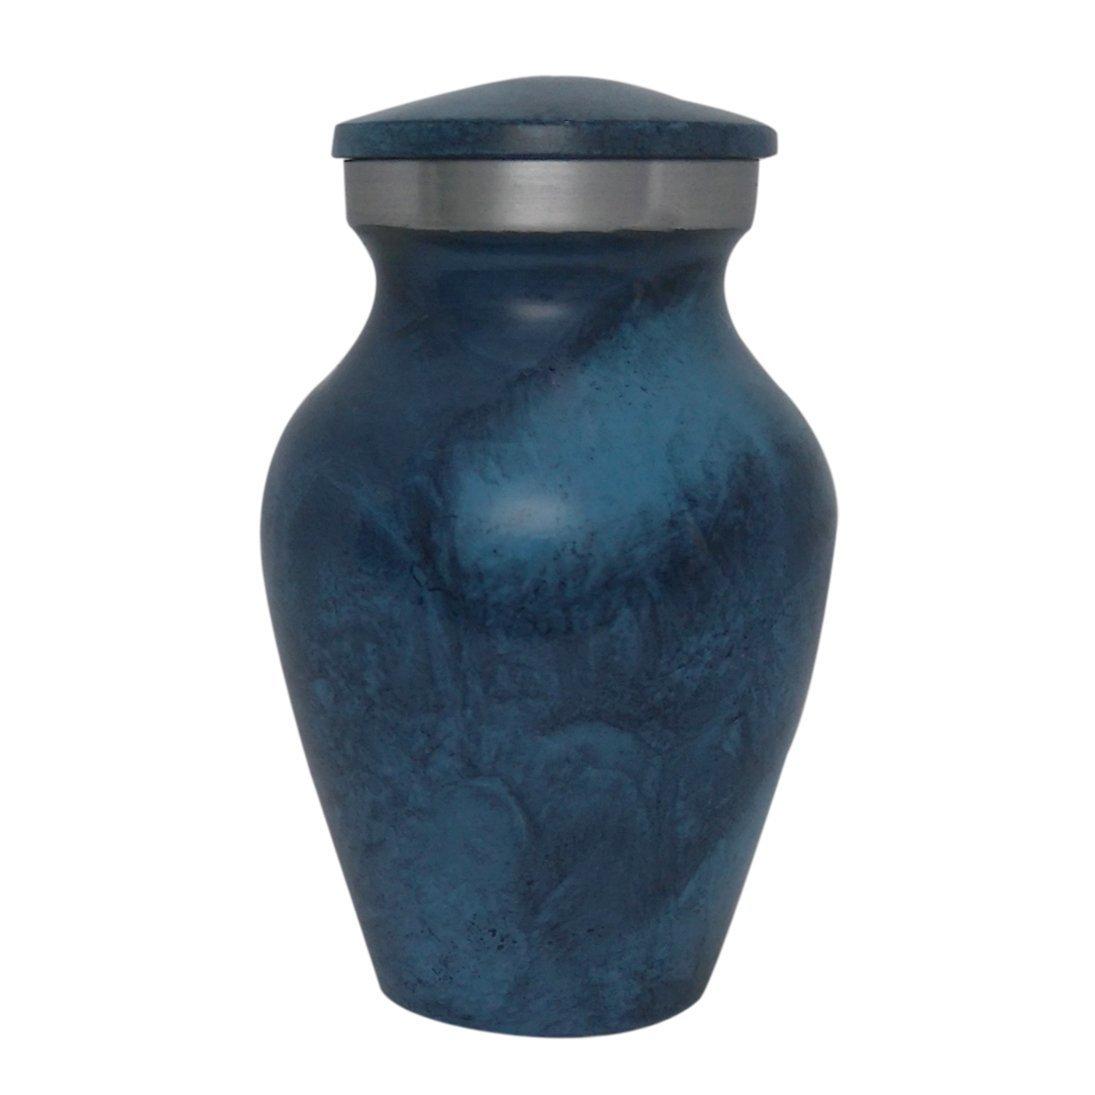 Aluminium Deep Blue Keepsake Urn for Ashes, Best Price Mini Urn